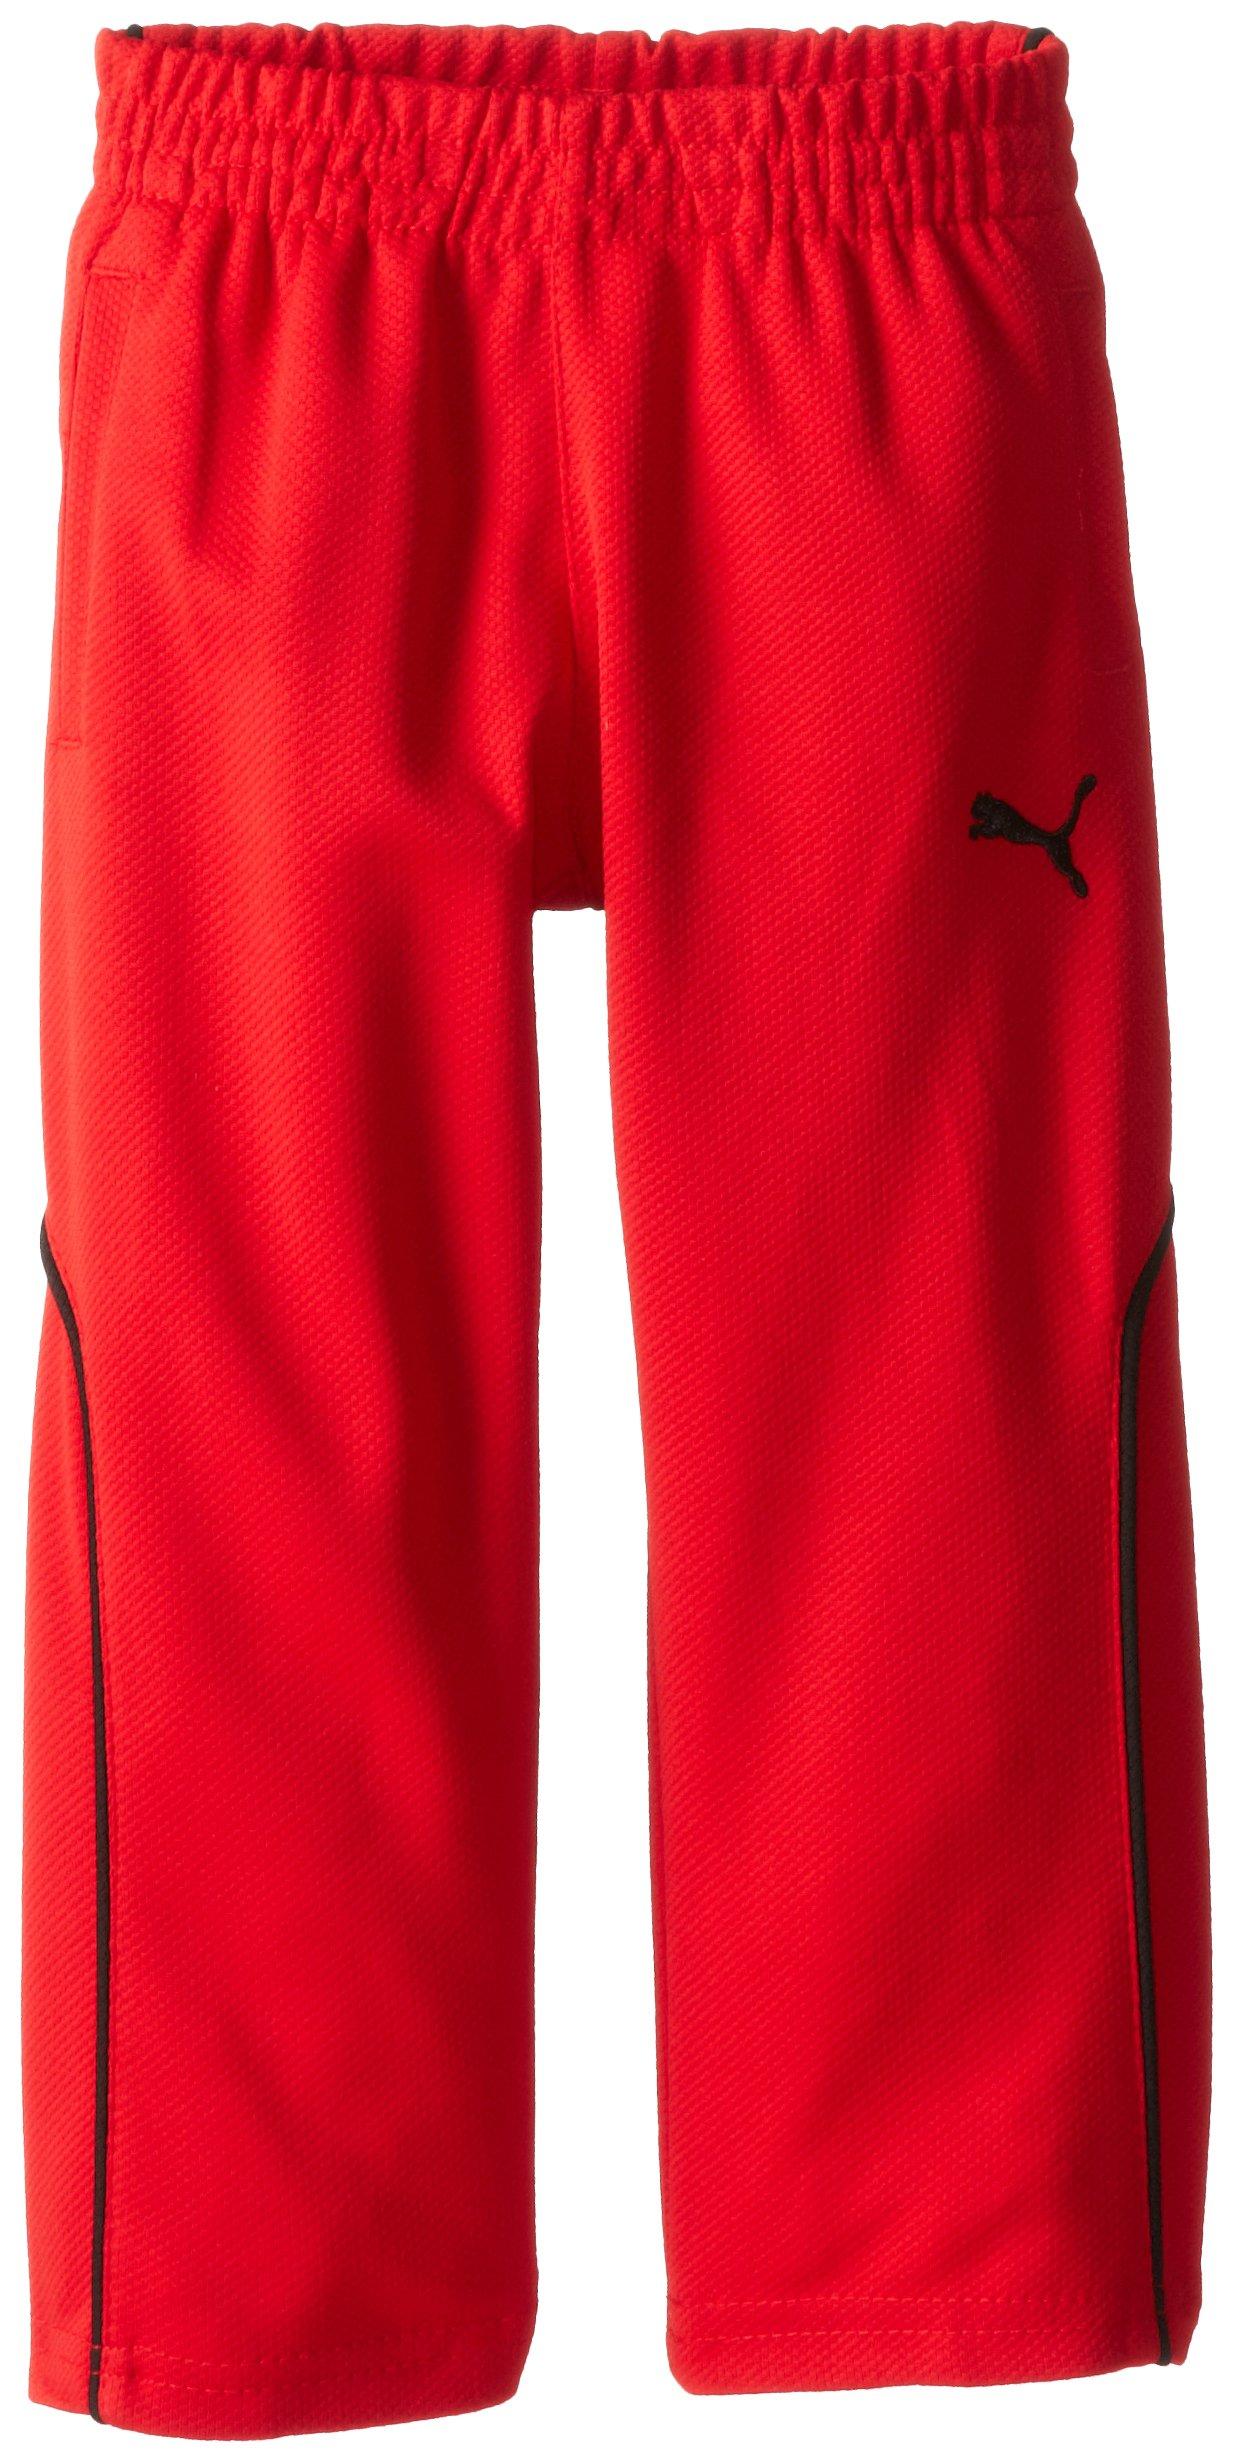 PUMA Little Boys' Training Pant 2, Red, 4T